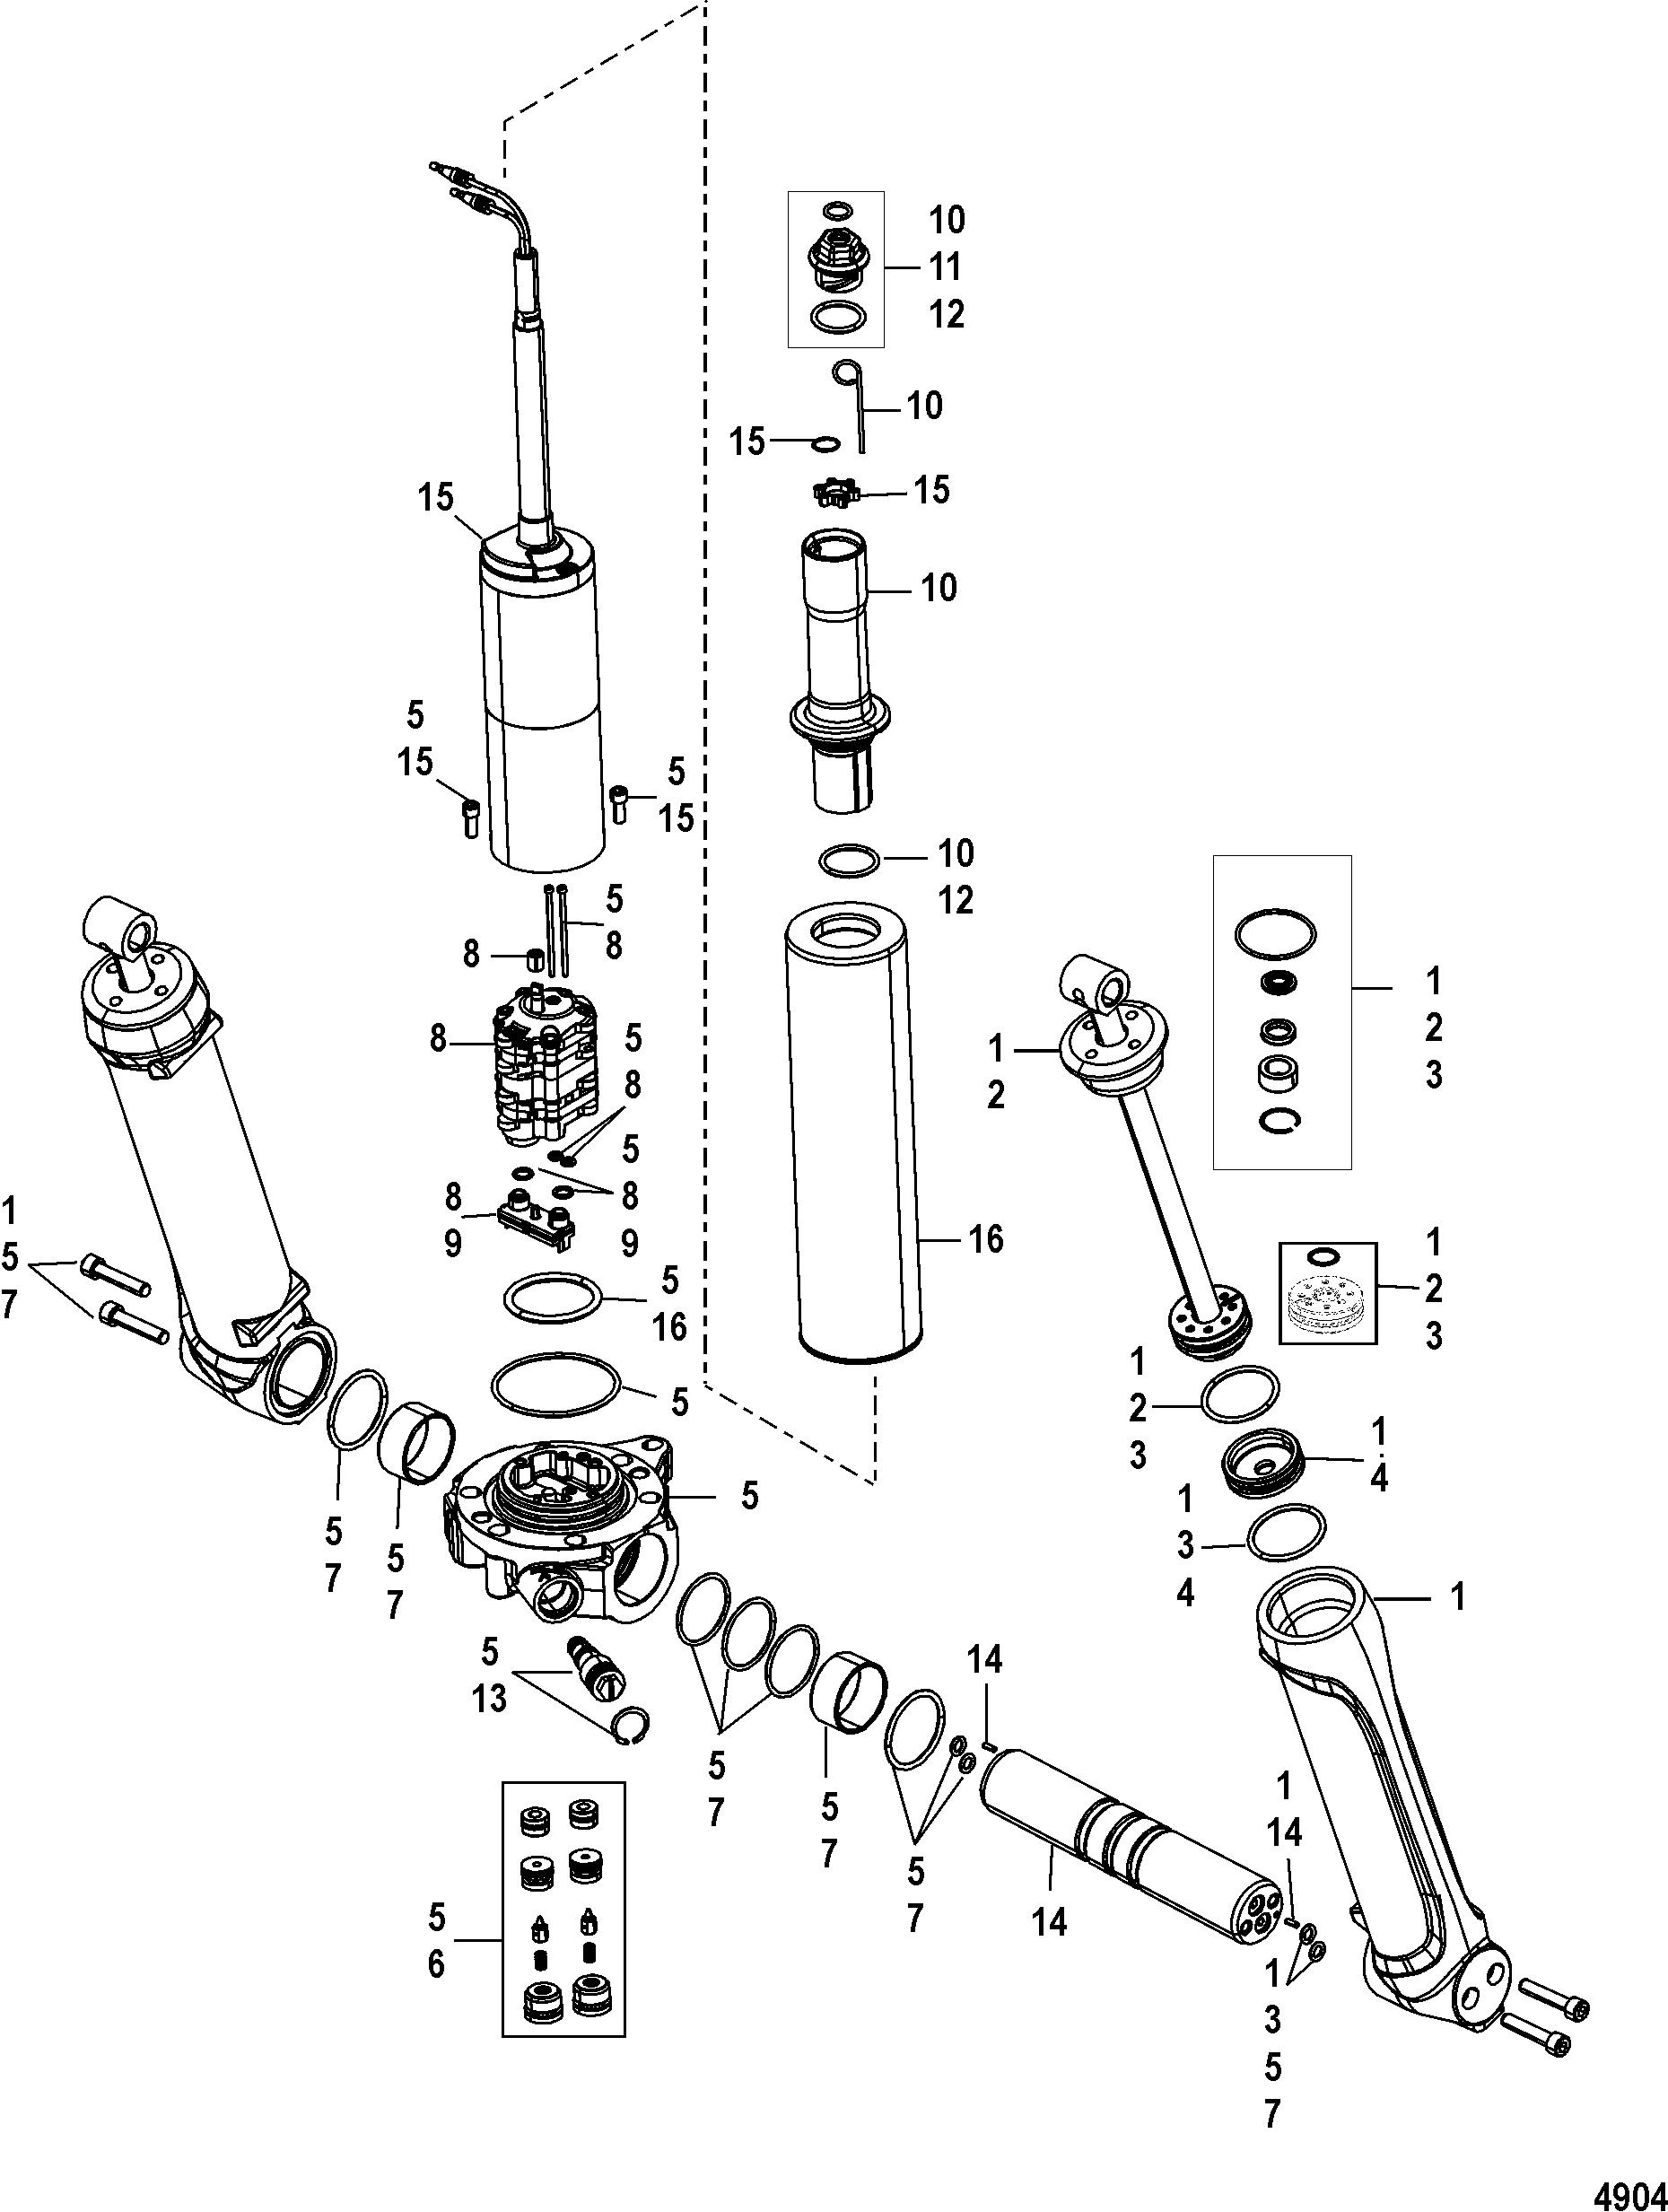 Power Trim Components For Mariner Mercury 200 225 250